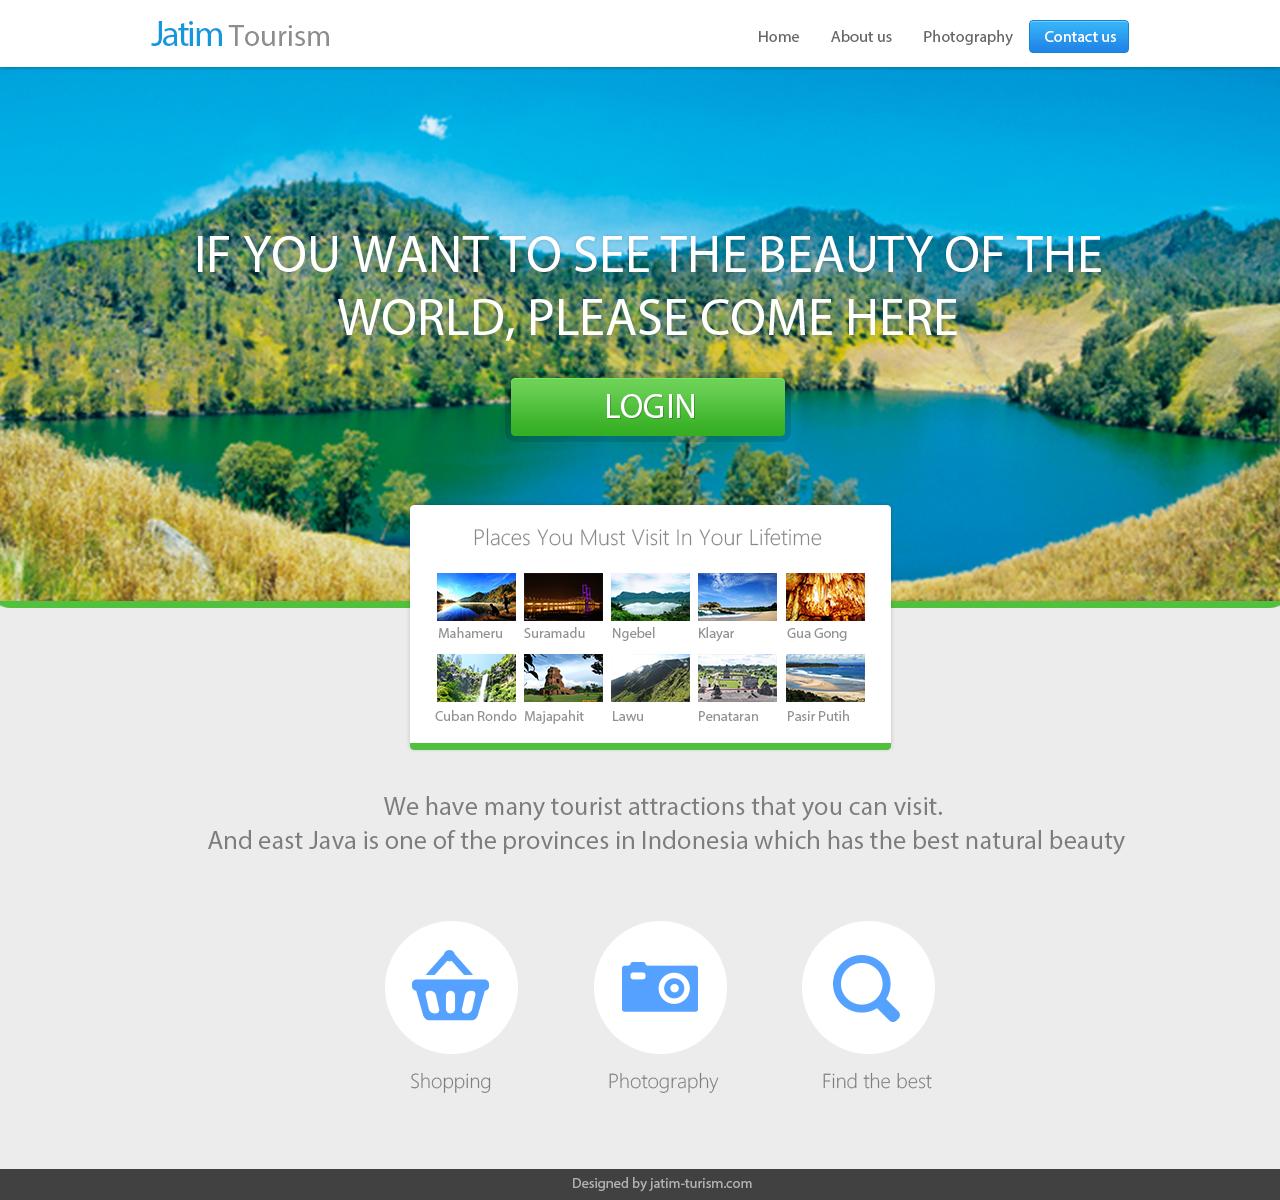 Design Template Website Company Profile For Jatim Tourism Tourism Tourism Website East Java